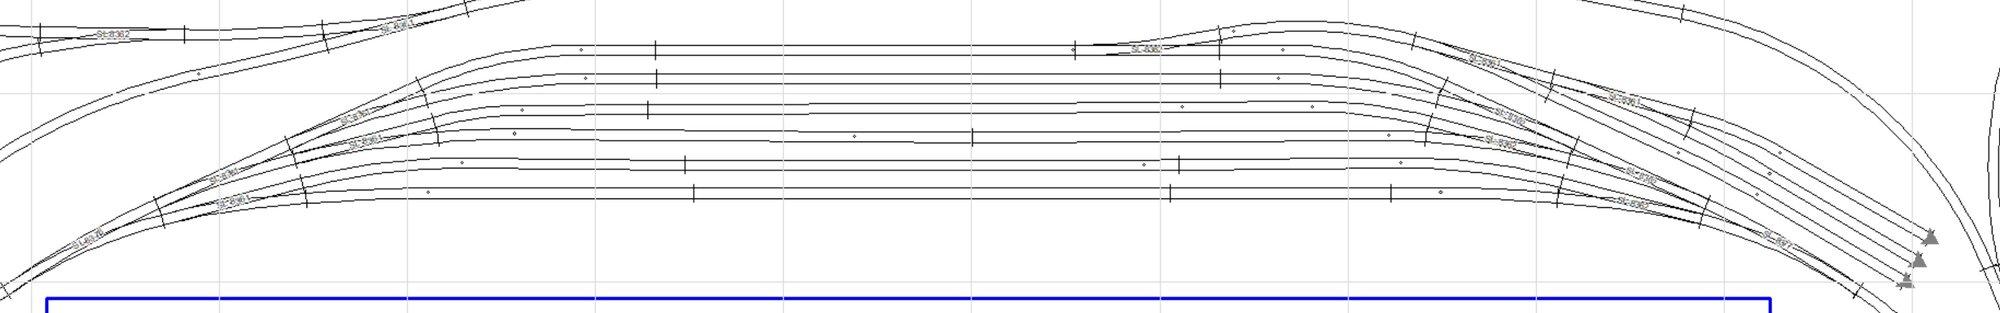 Trackplan DRAFT_North Yard 13 3.20.2021.jpg